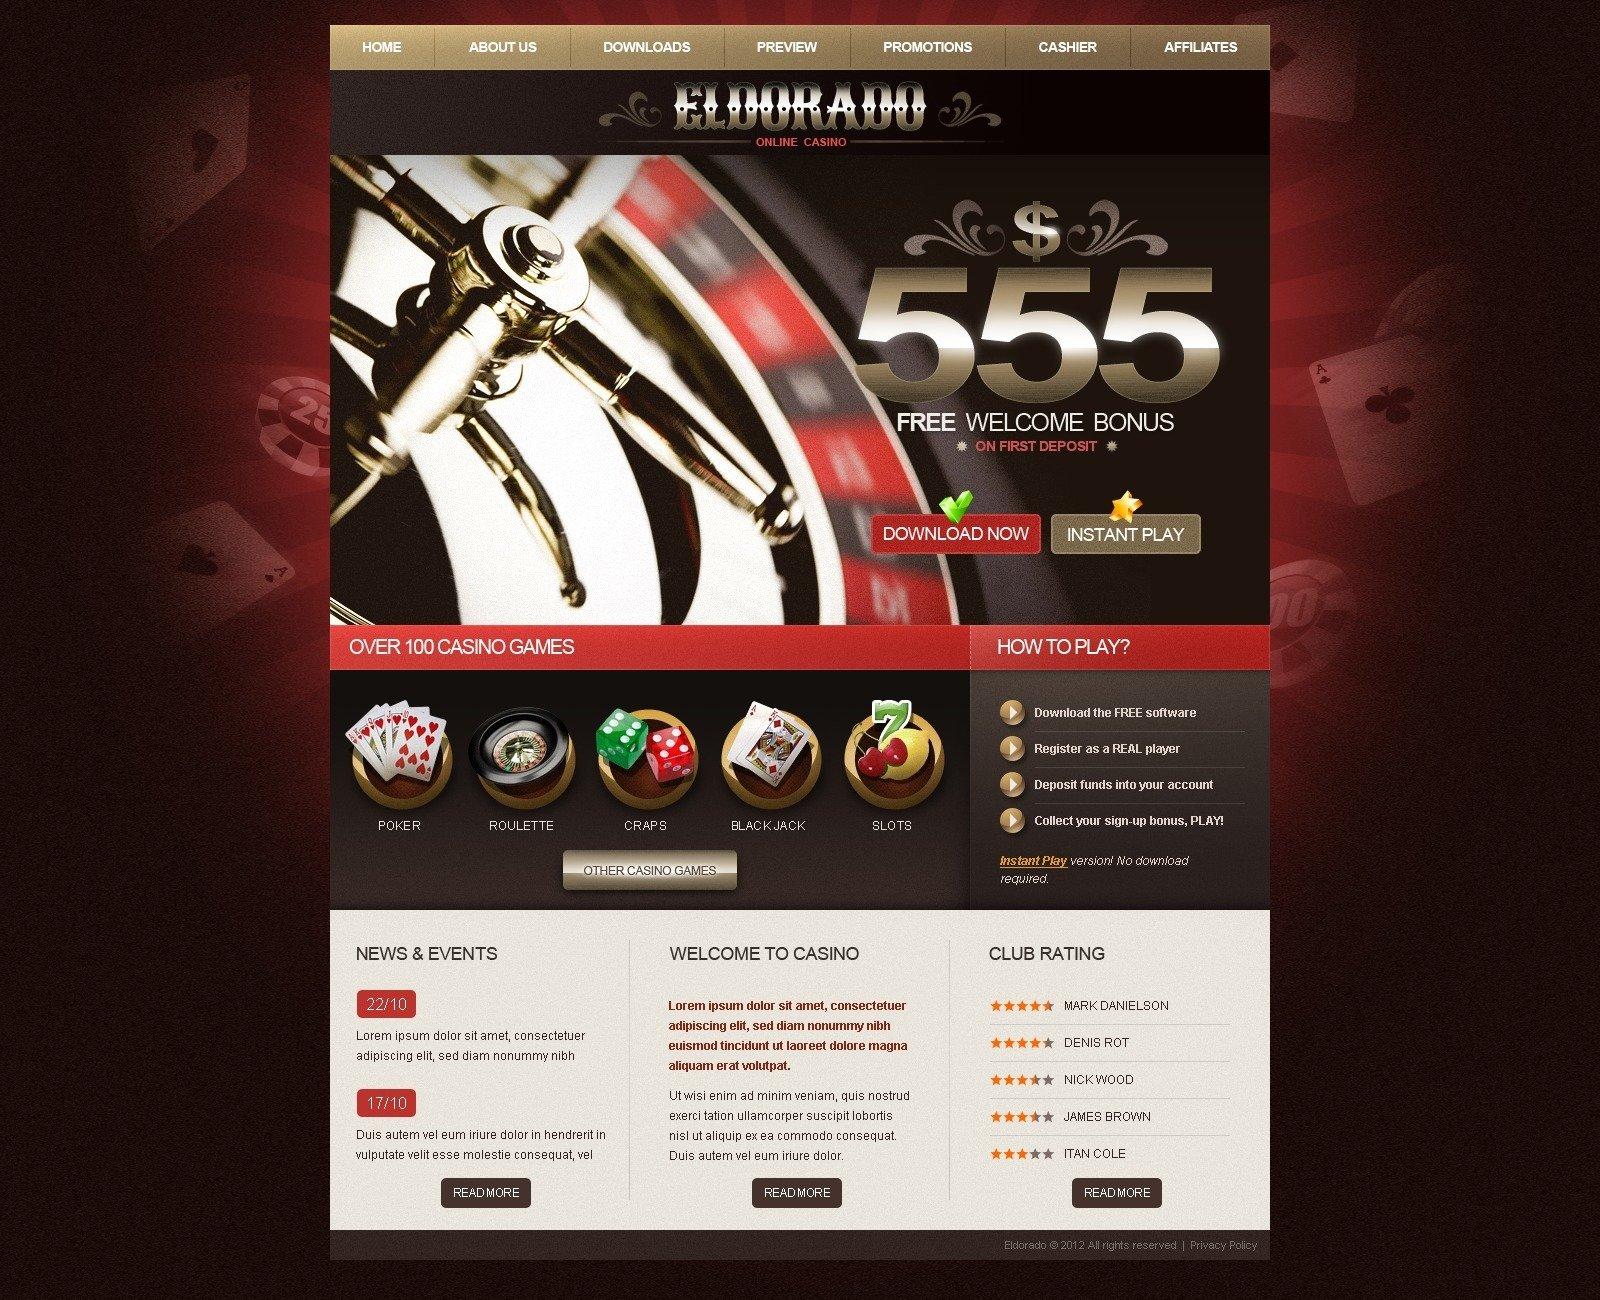 Template monster casino broadway casino birmingham poker